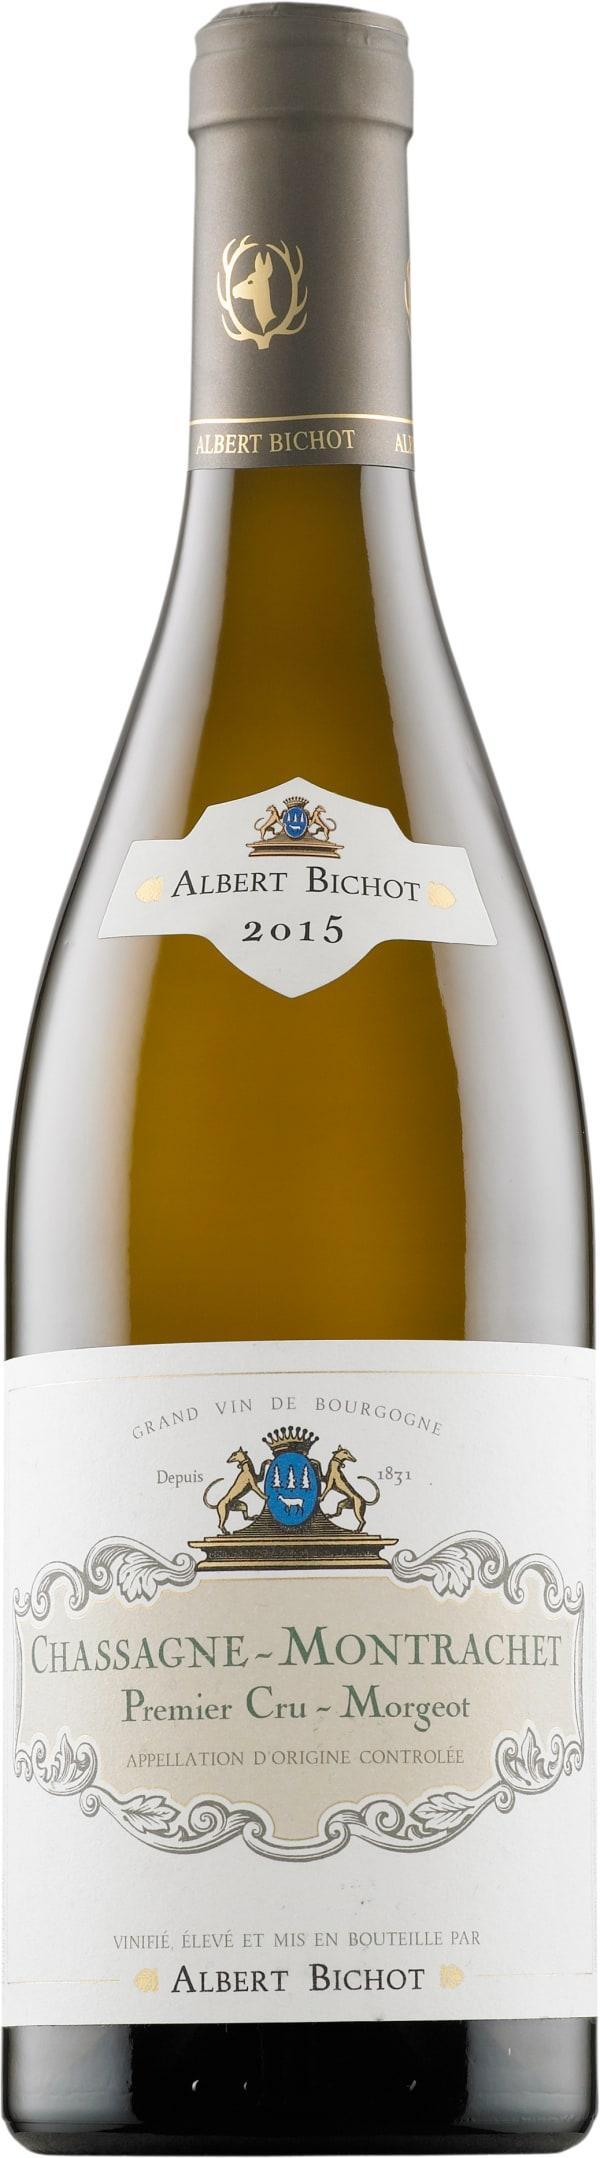 Albert Bichot Chassagne-Montrachet 1er Cru Morgeot 2018